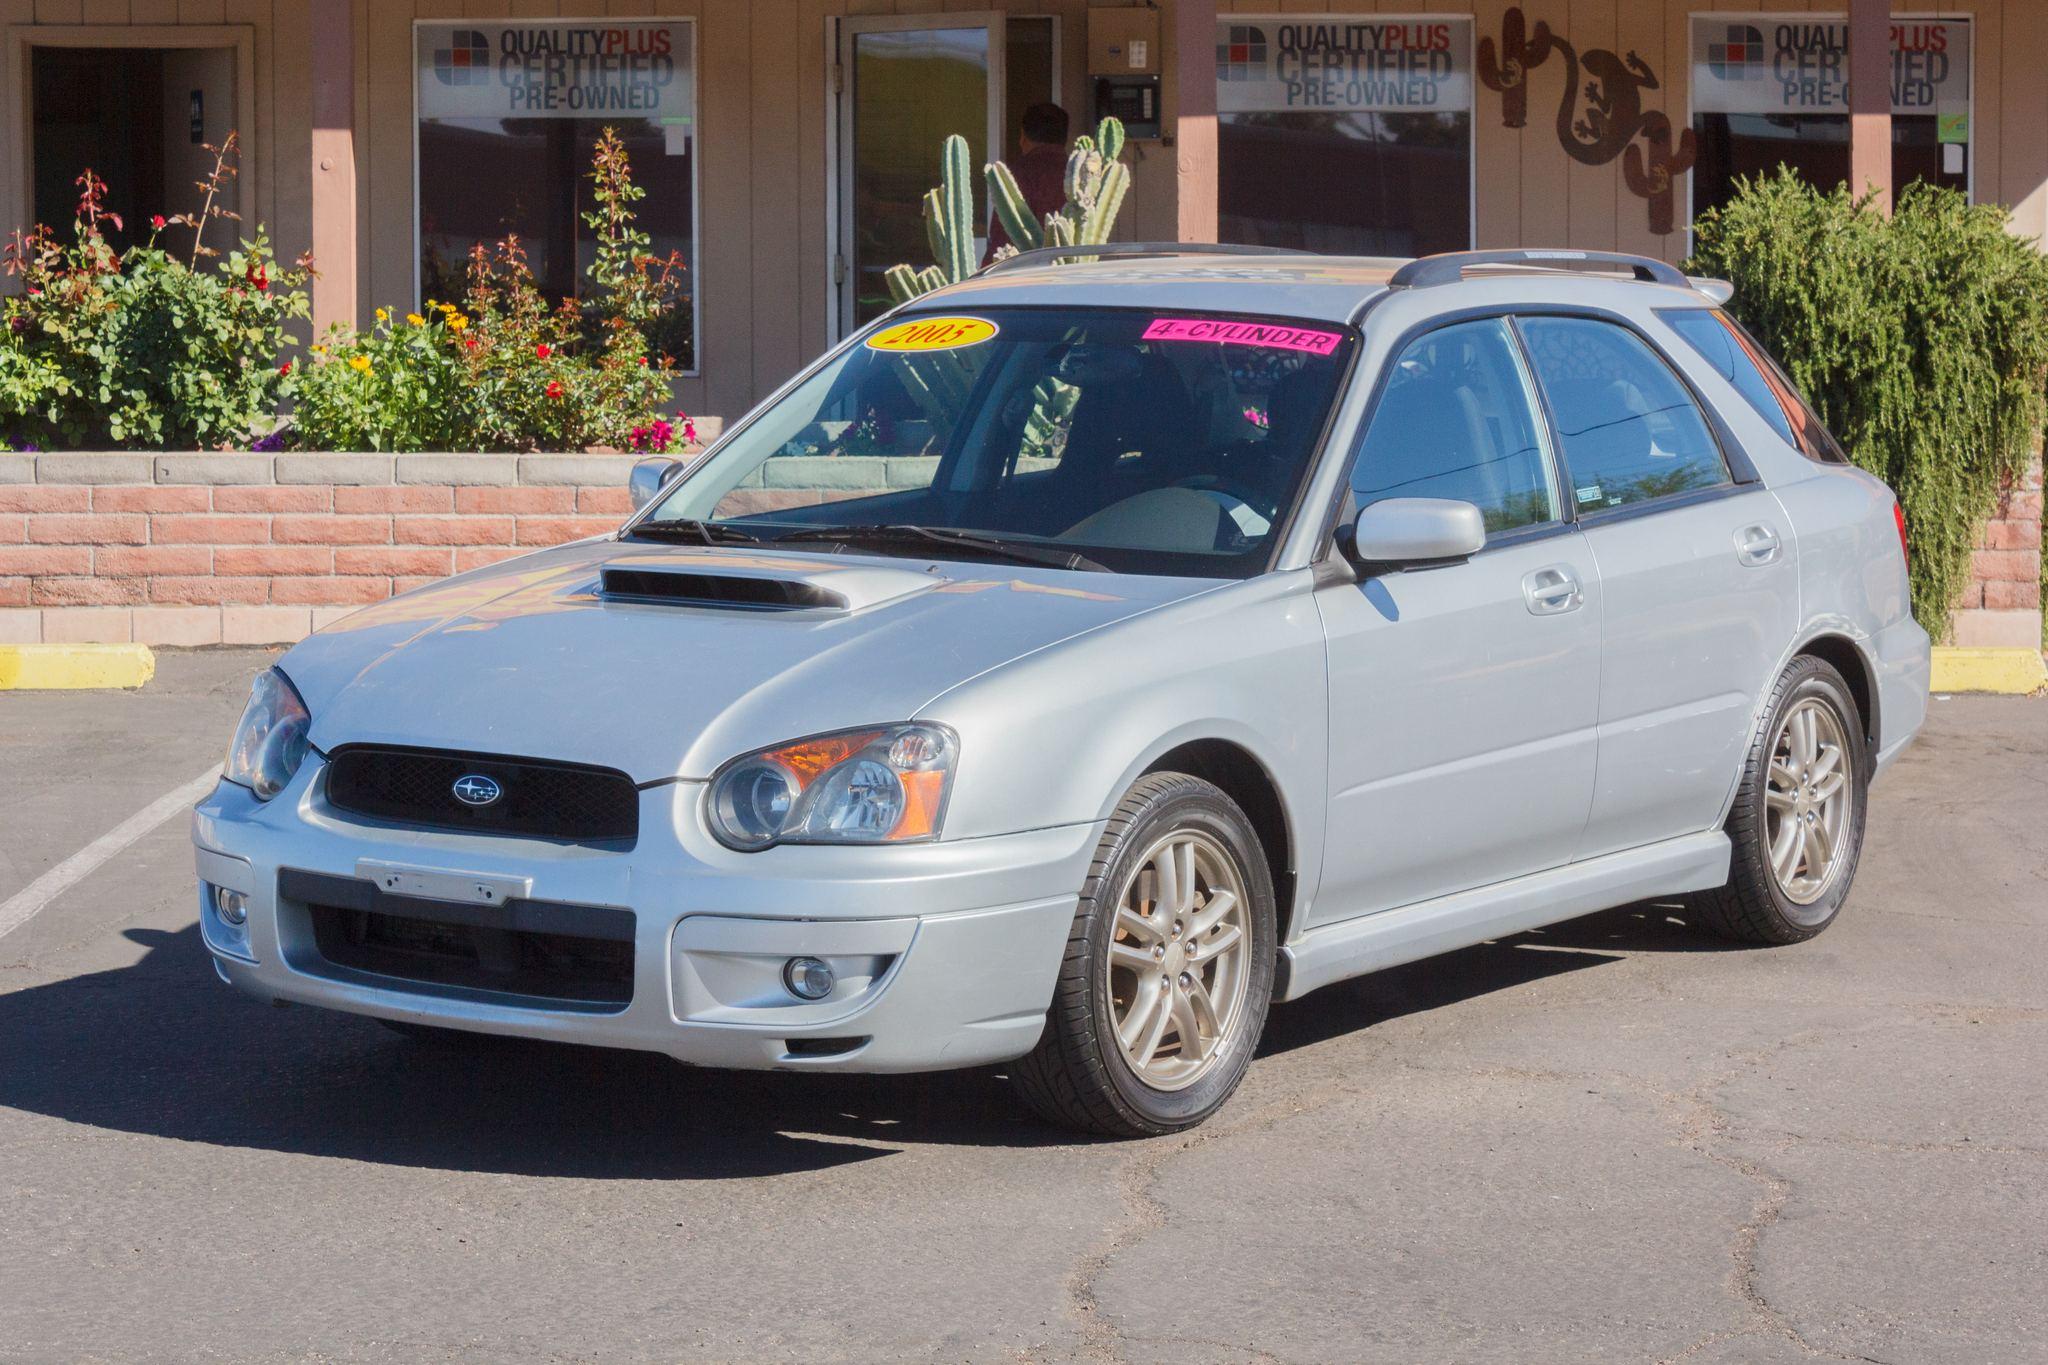 Photo of 2005 Subaru Impreza Wagon 4d Wagon WRX Platinum Silver Metallic